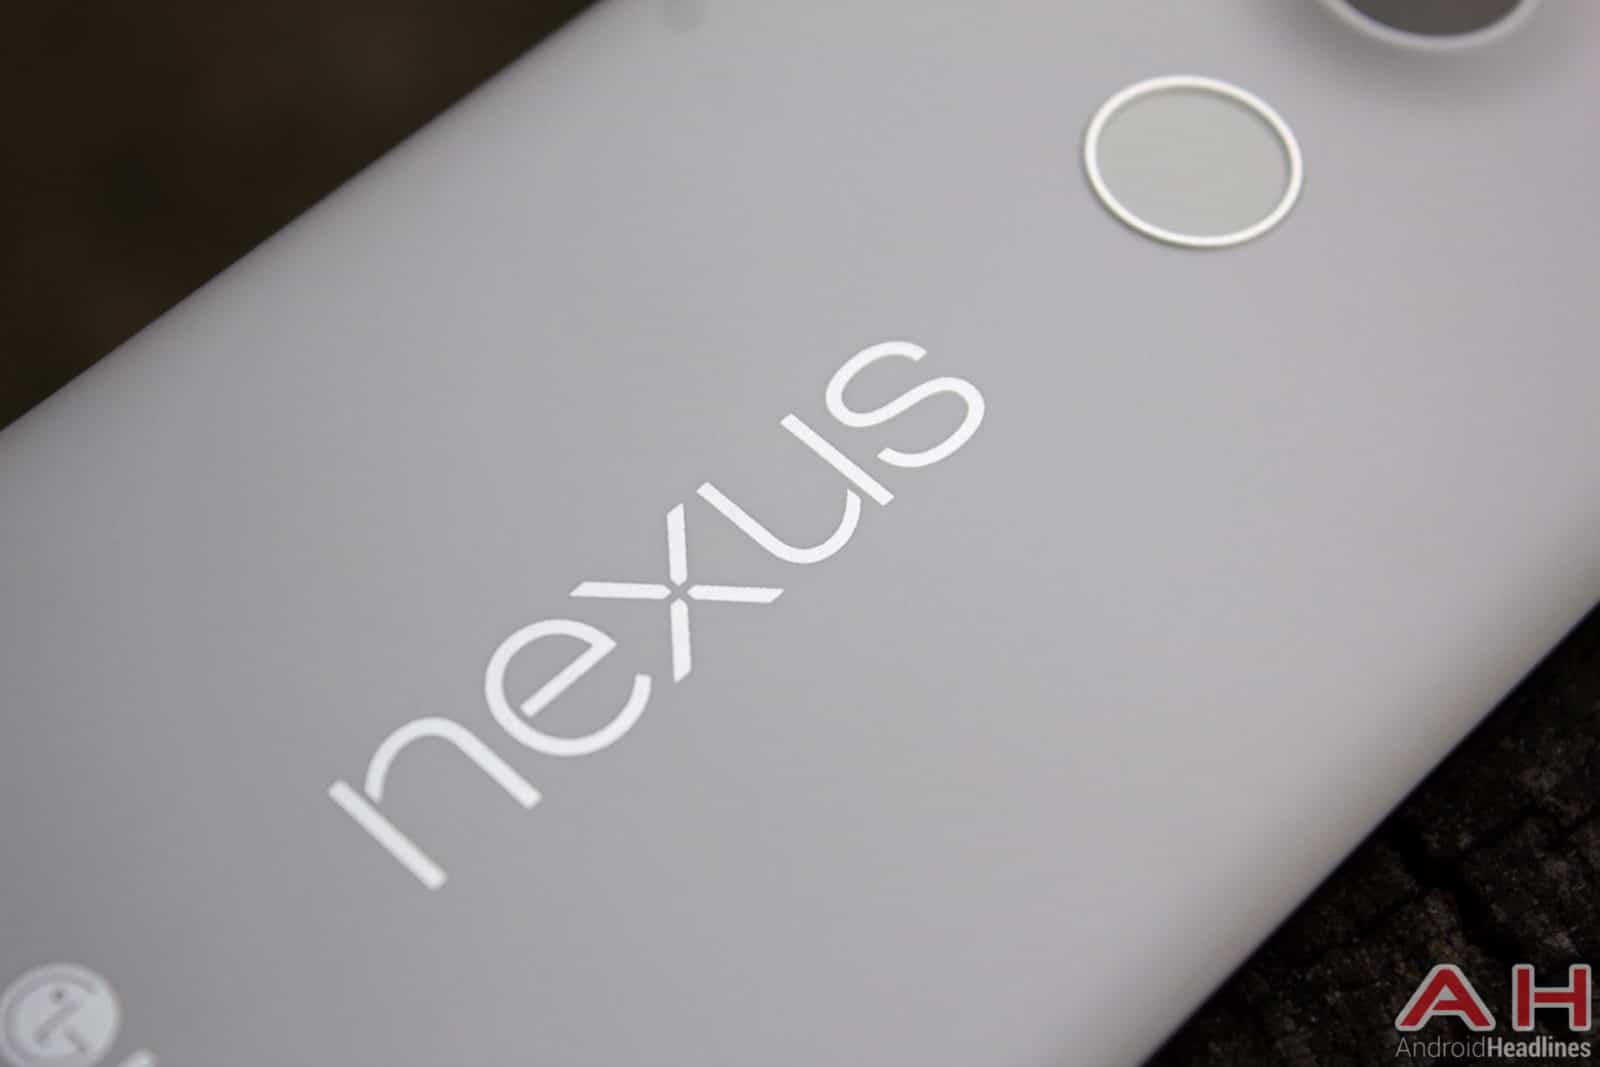 Nexus-5x-AH-logo-1